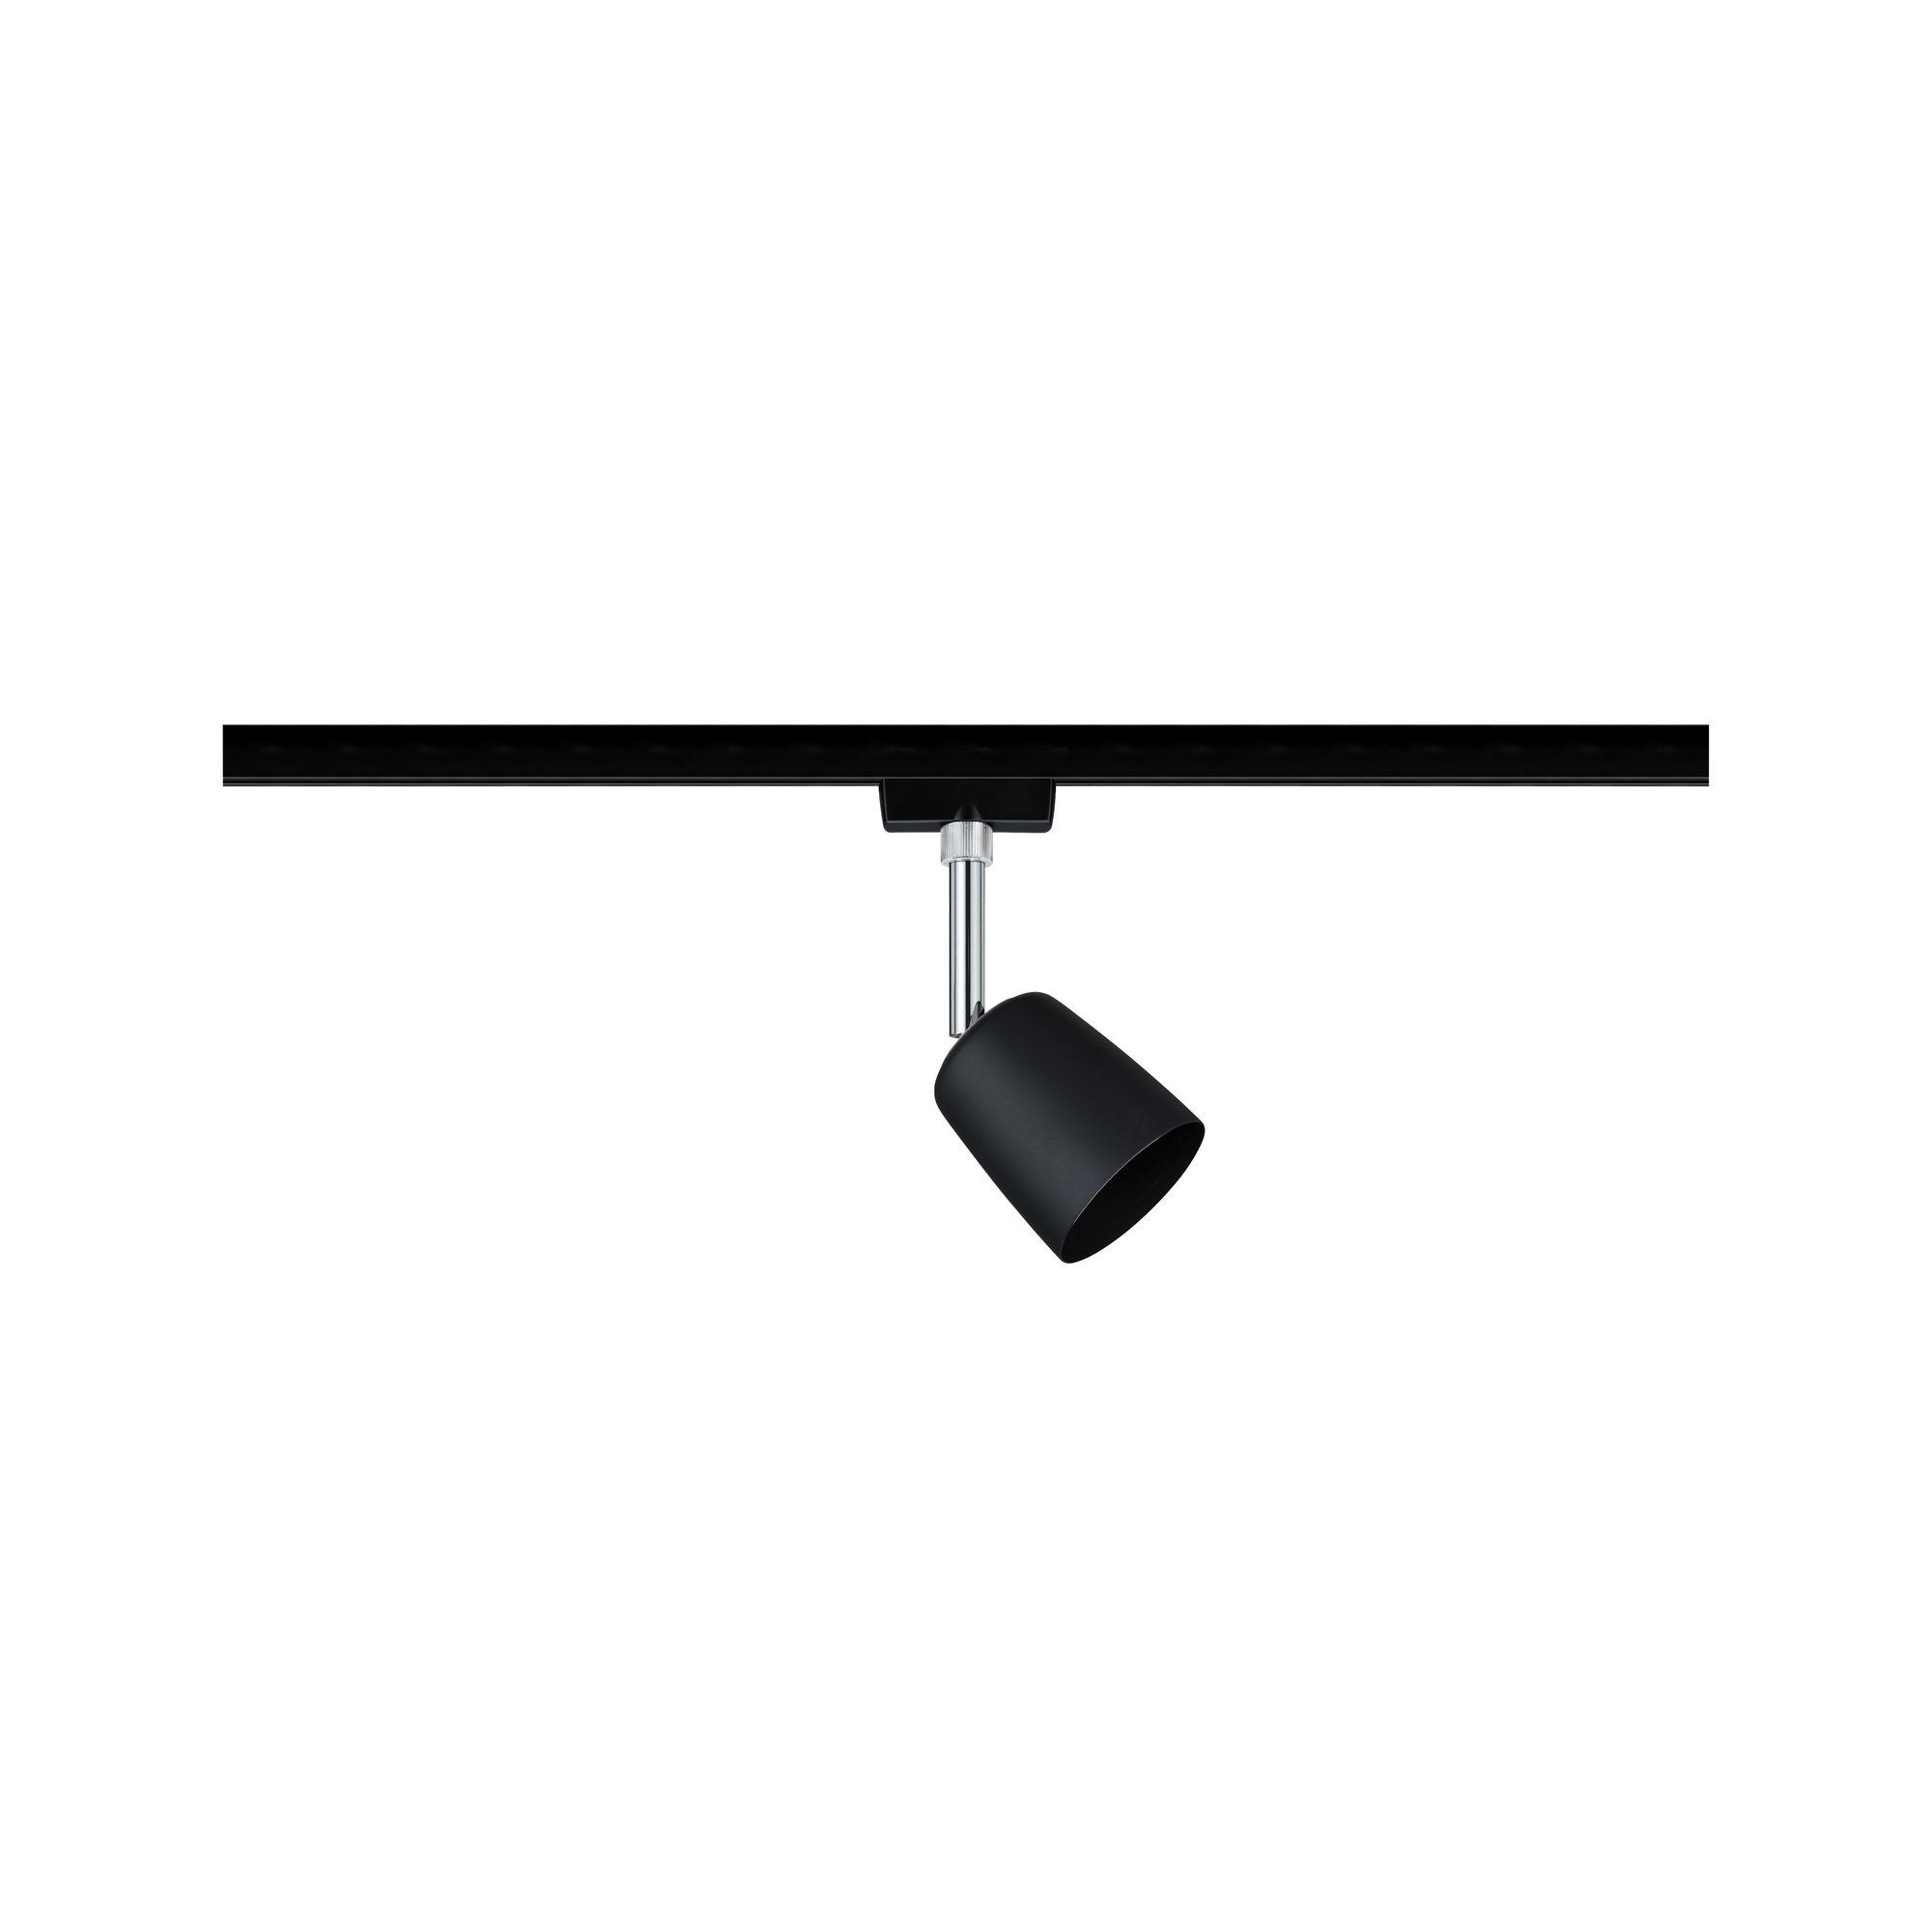 Paulmann URail Spot Cover max 1x10W GU10 Schwarz matt/Chrom 230V Metall/Kunststoff